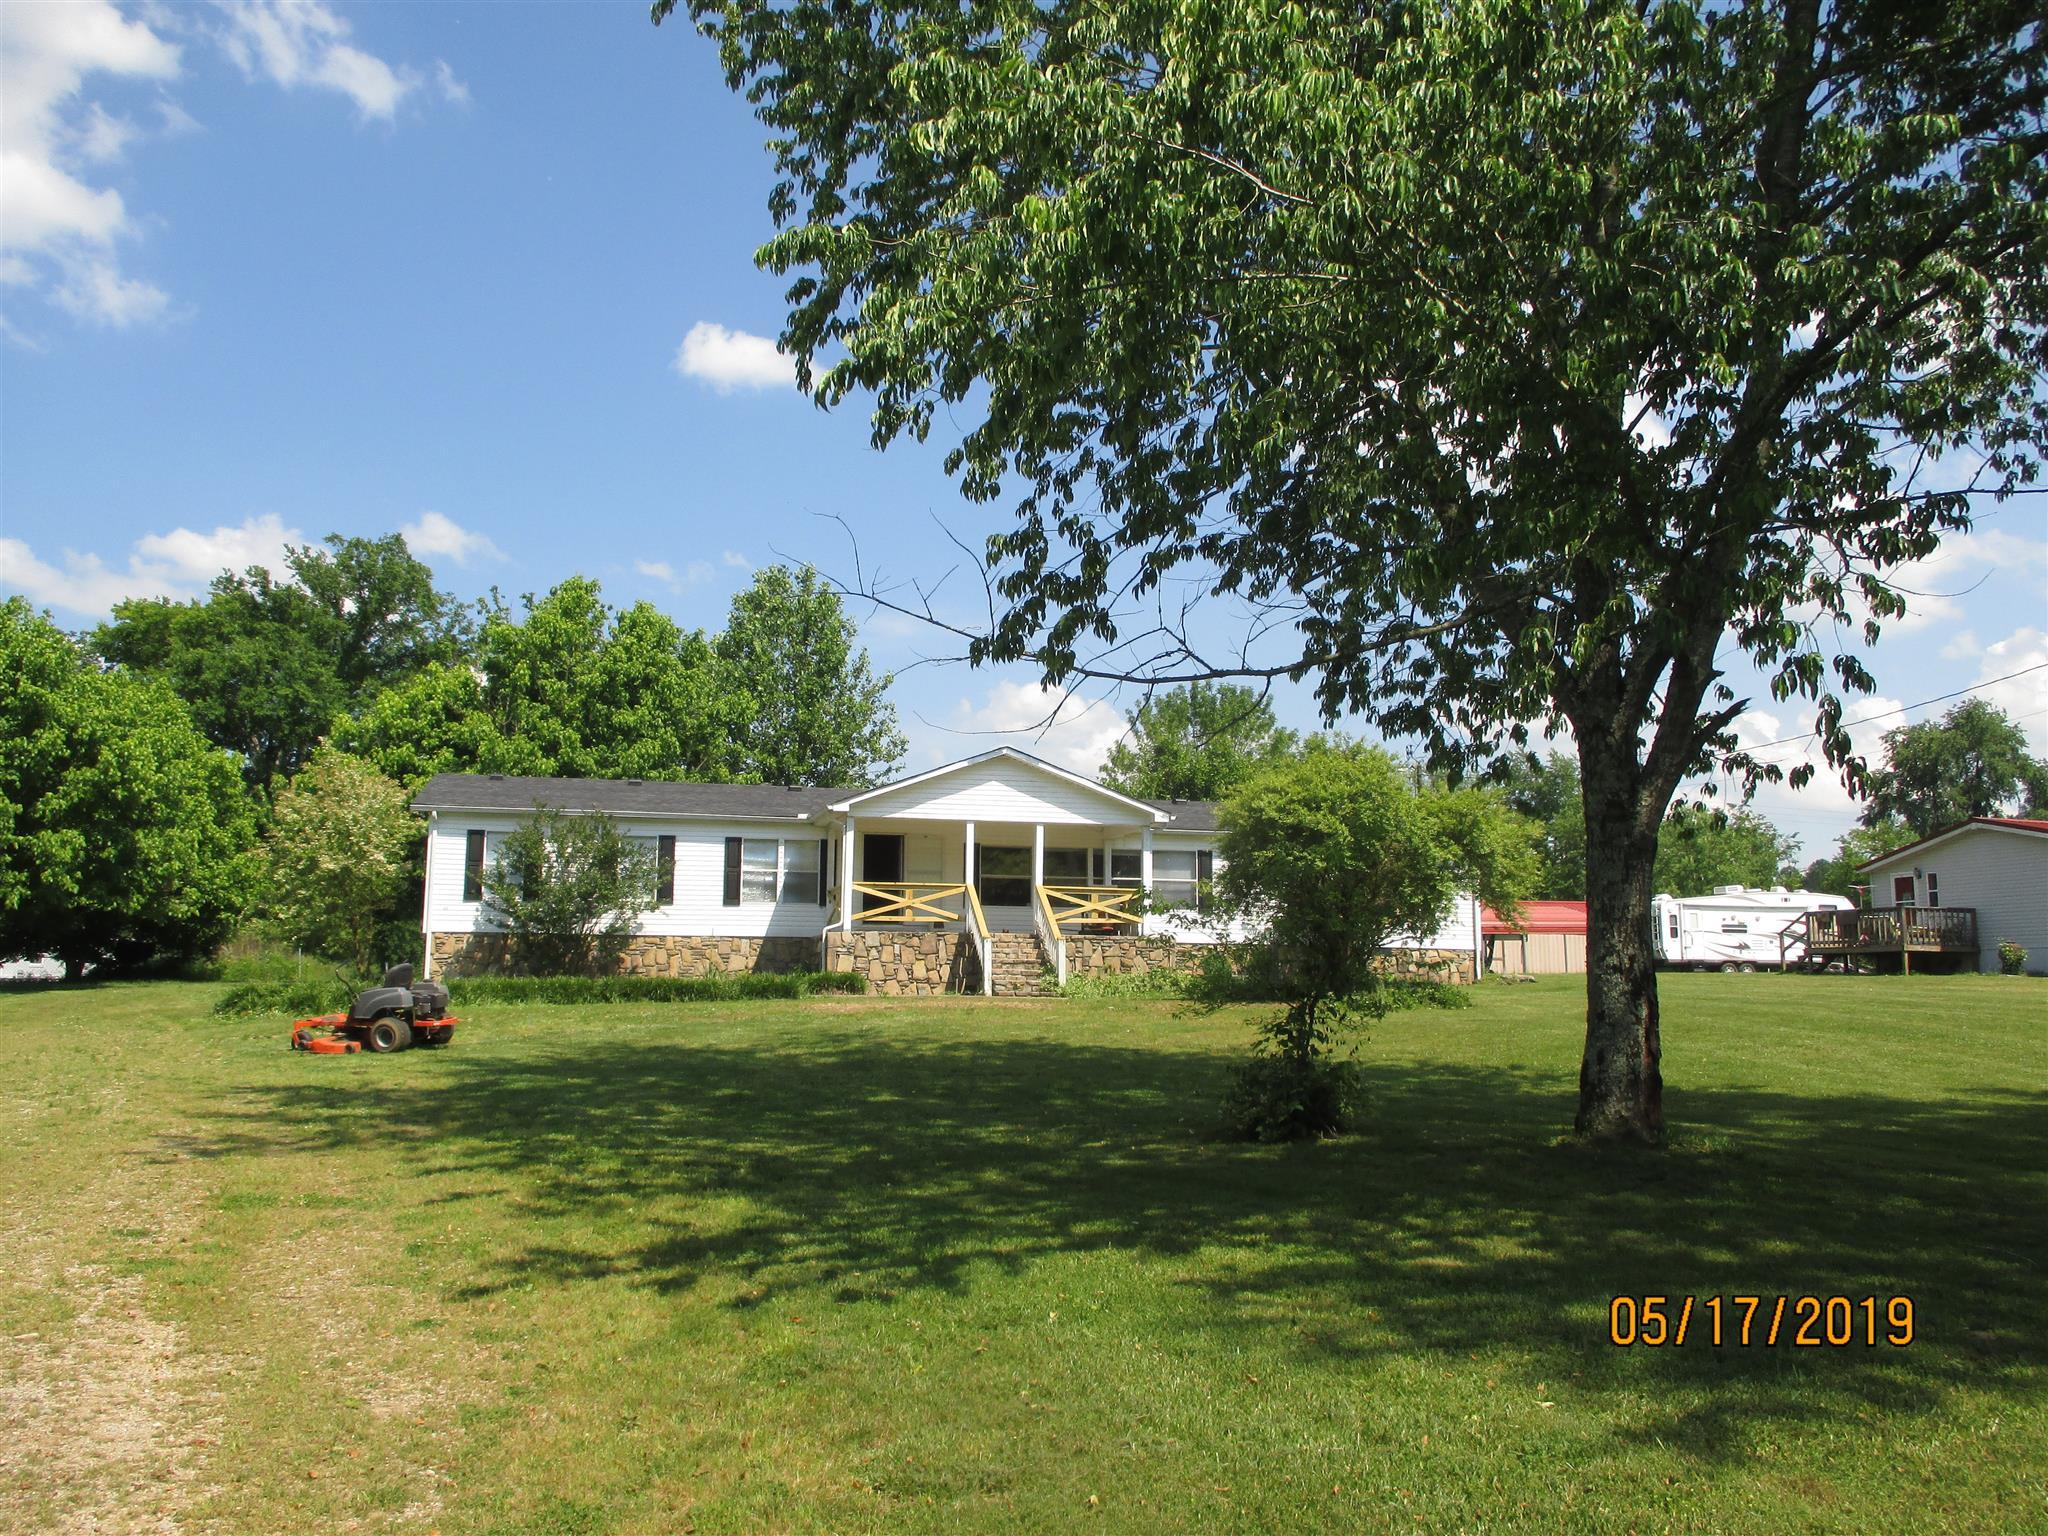 8625 Dog Branch Rd, Mount Pleasant, TN 38474 - Mount Pleasant, TN real estate listing